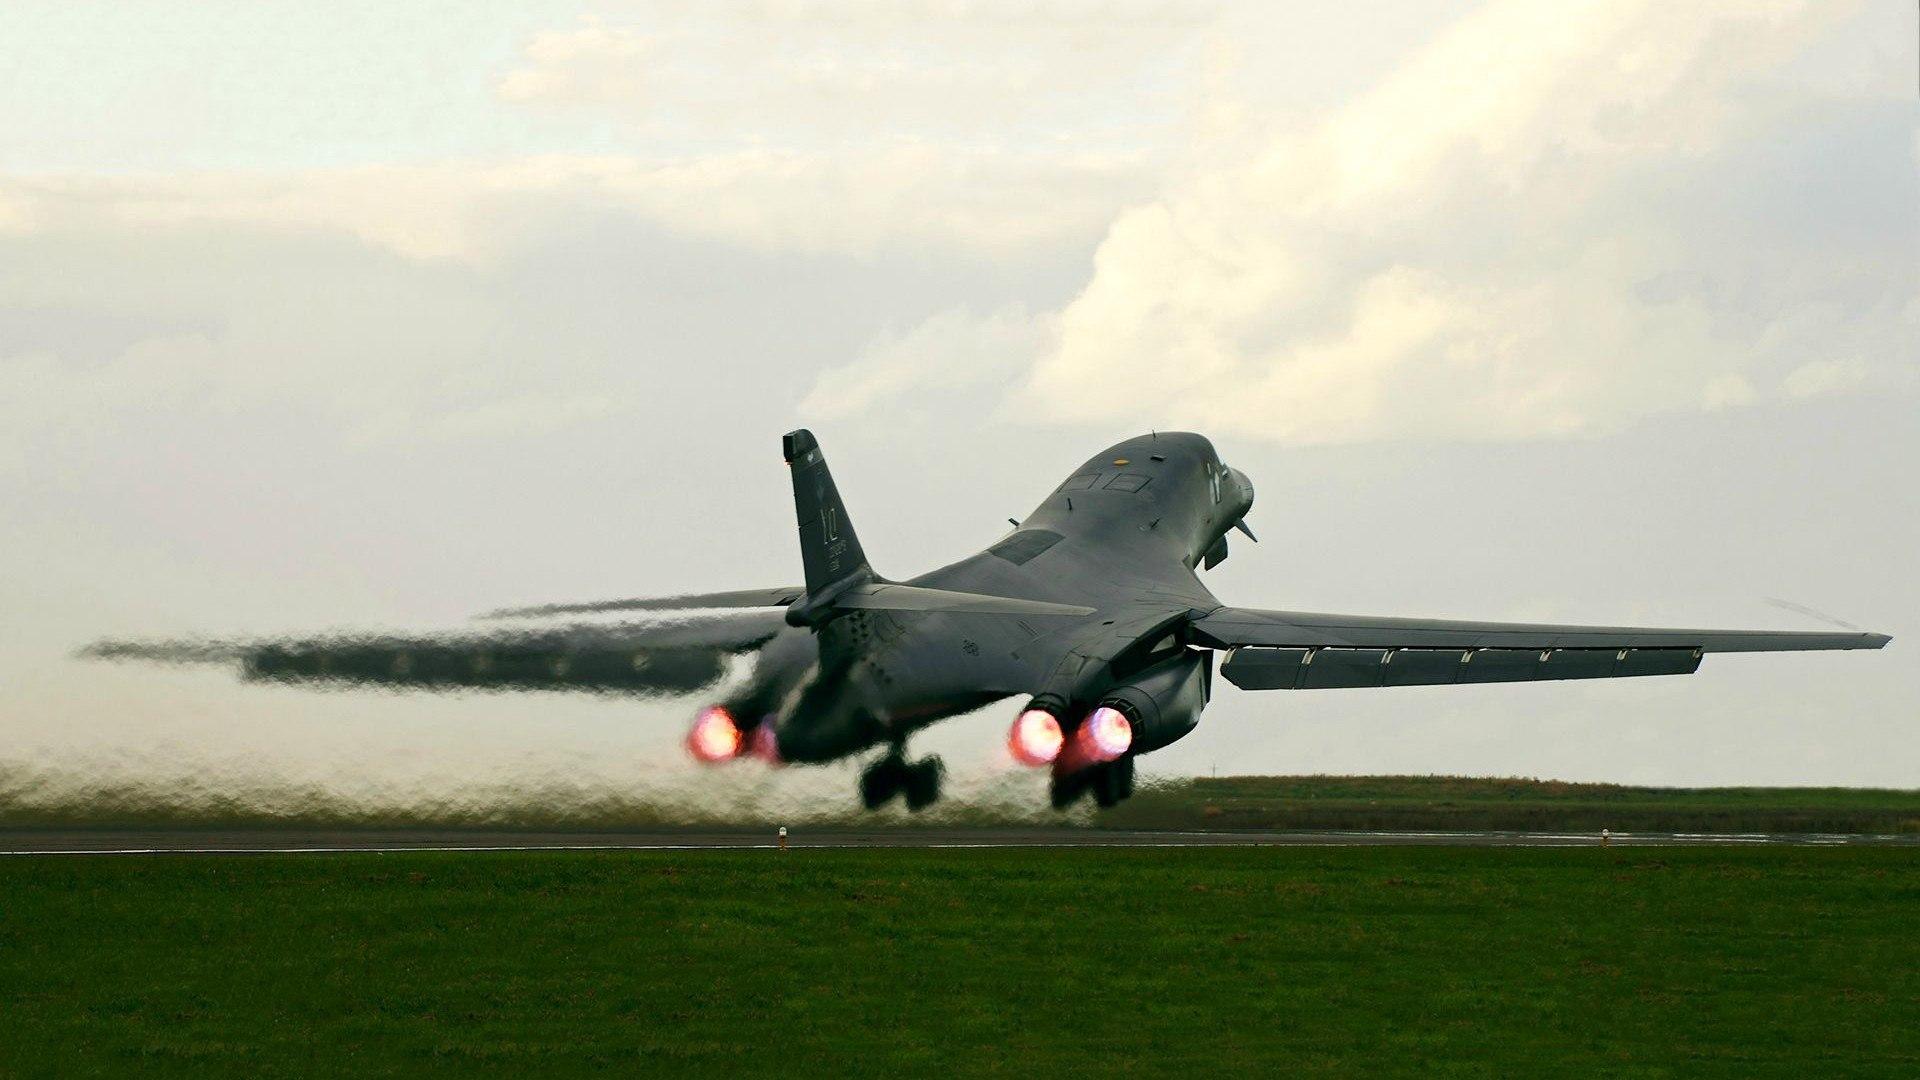 b 1b lancer bomber wallpaper - photo #1